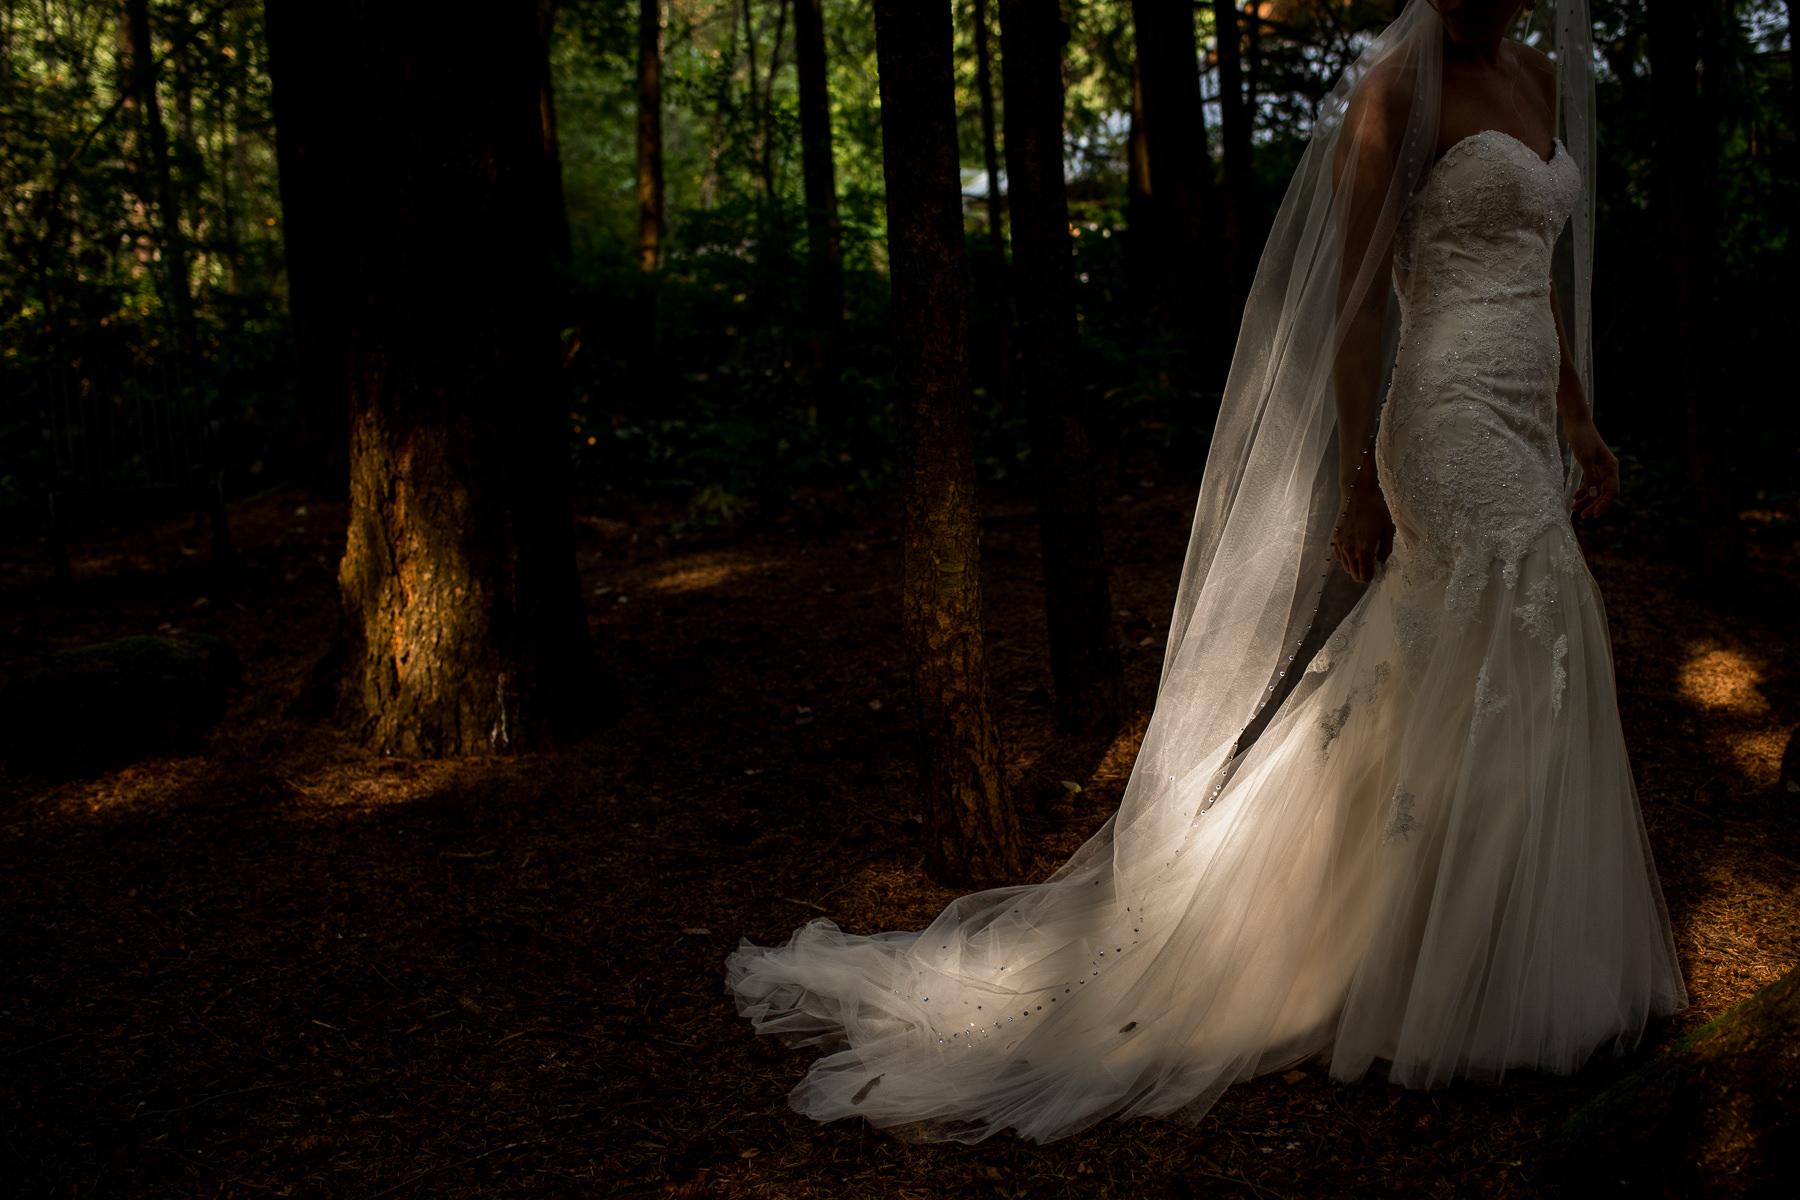 wedding dress in amazing light